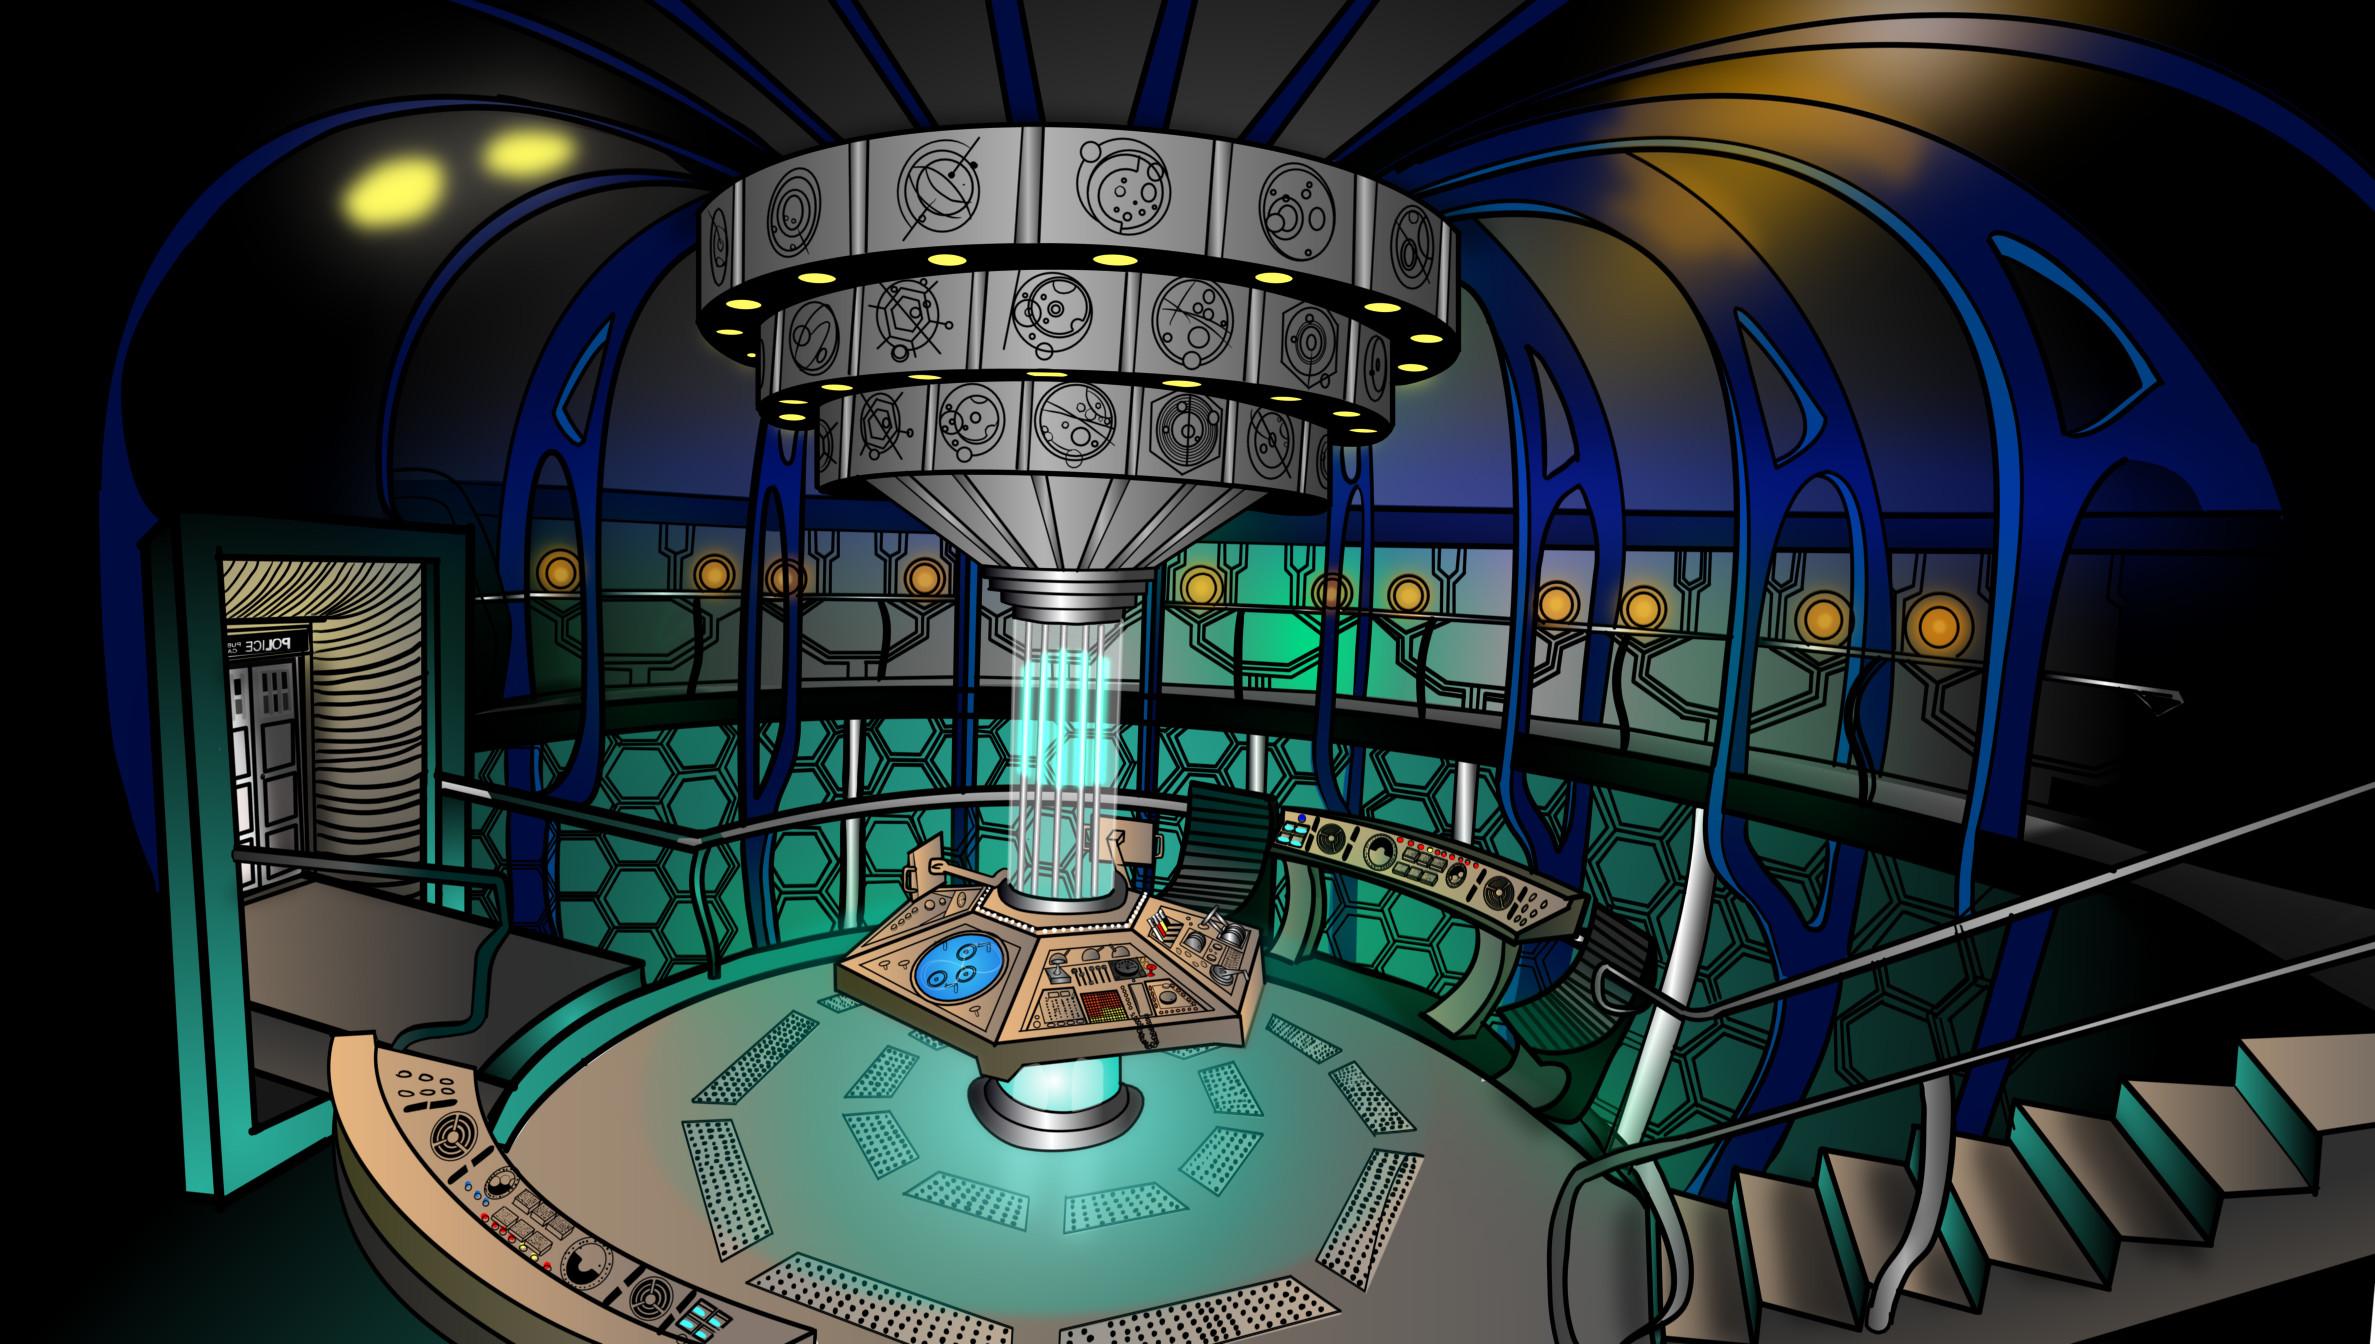 Tardis Interior by MilminoDraws Tardis Interior by MilminoDraws